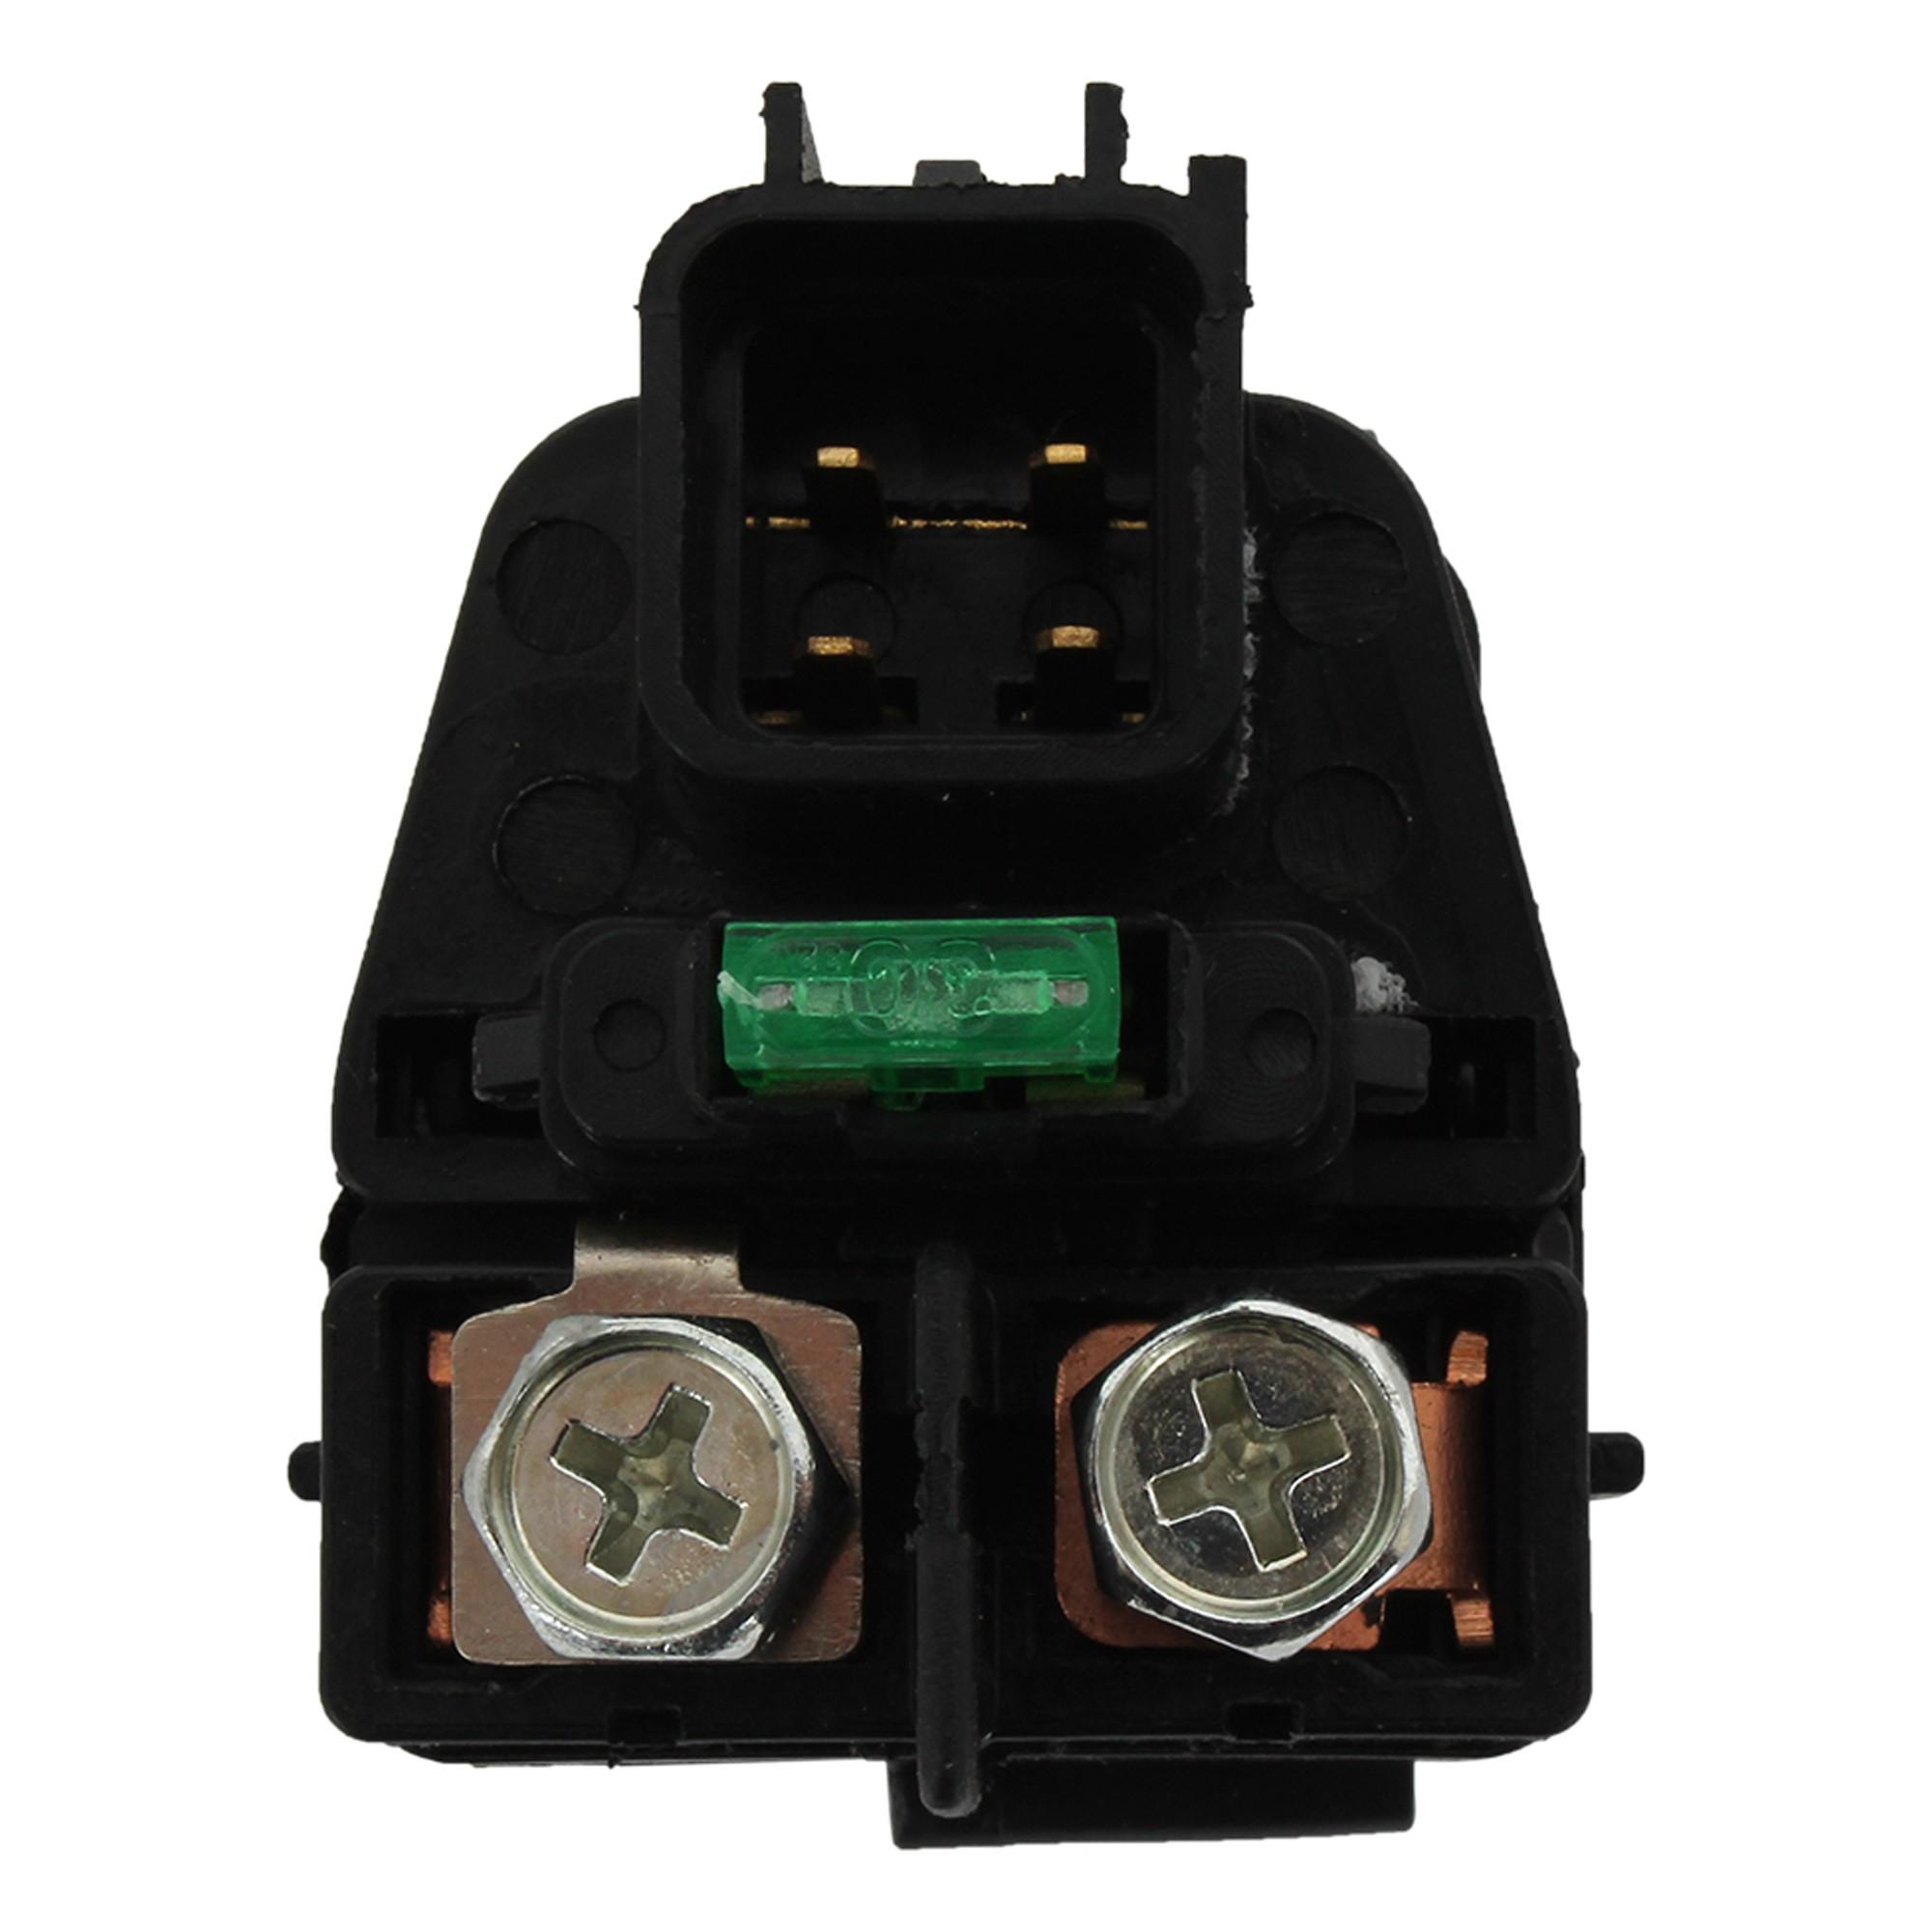 4Pcs PREMIUM Roll Bar Grab Handle Handles Black for Jeep Wrangler CJ YJ dfg